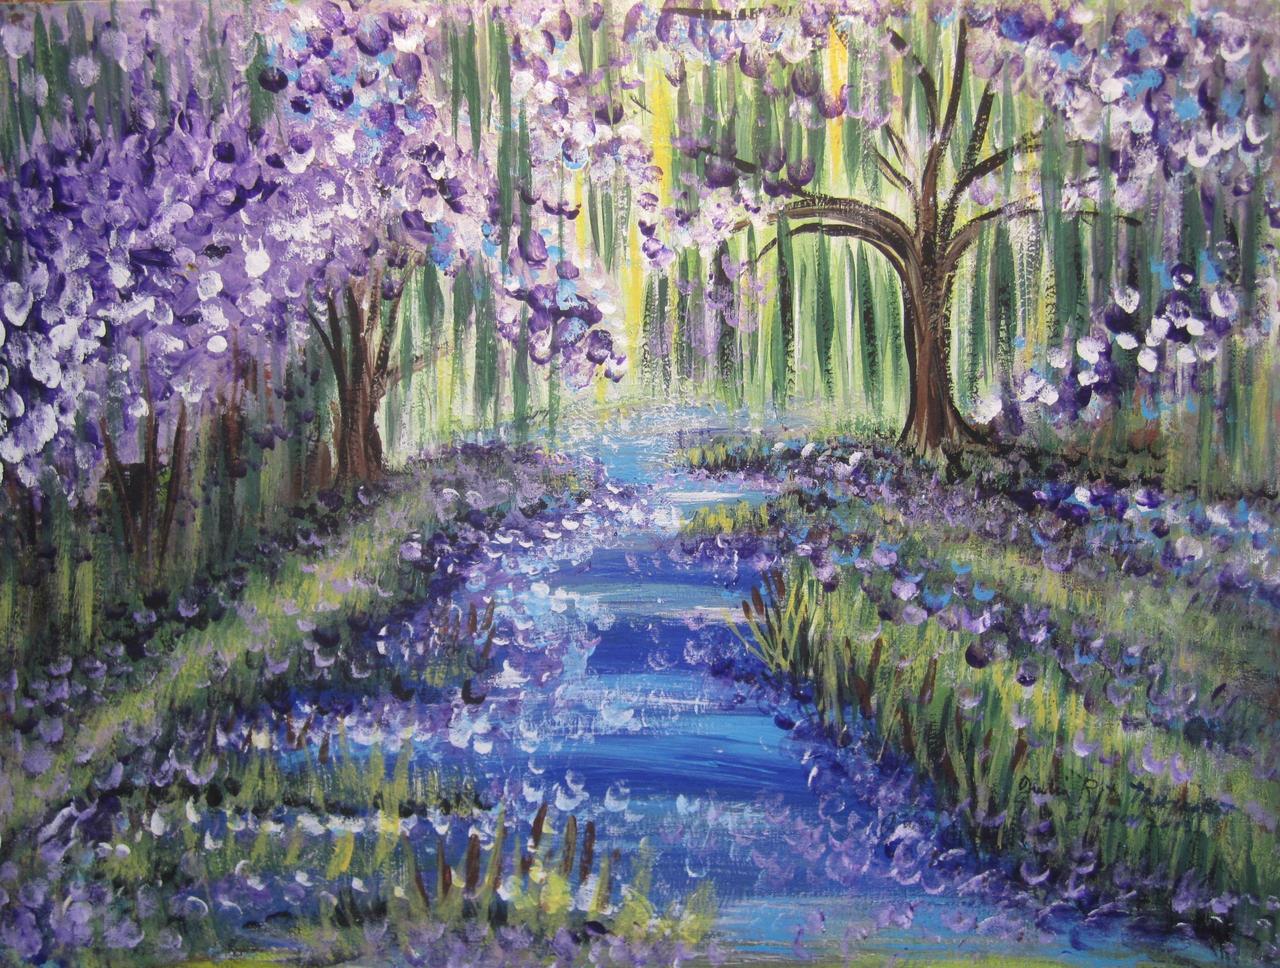 Purple Petals by juliarita